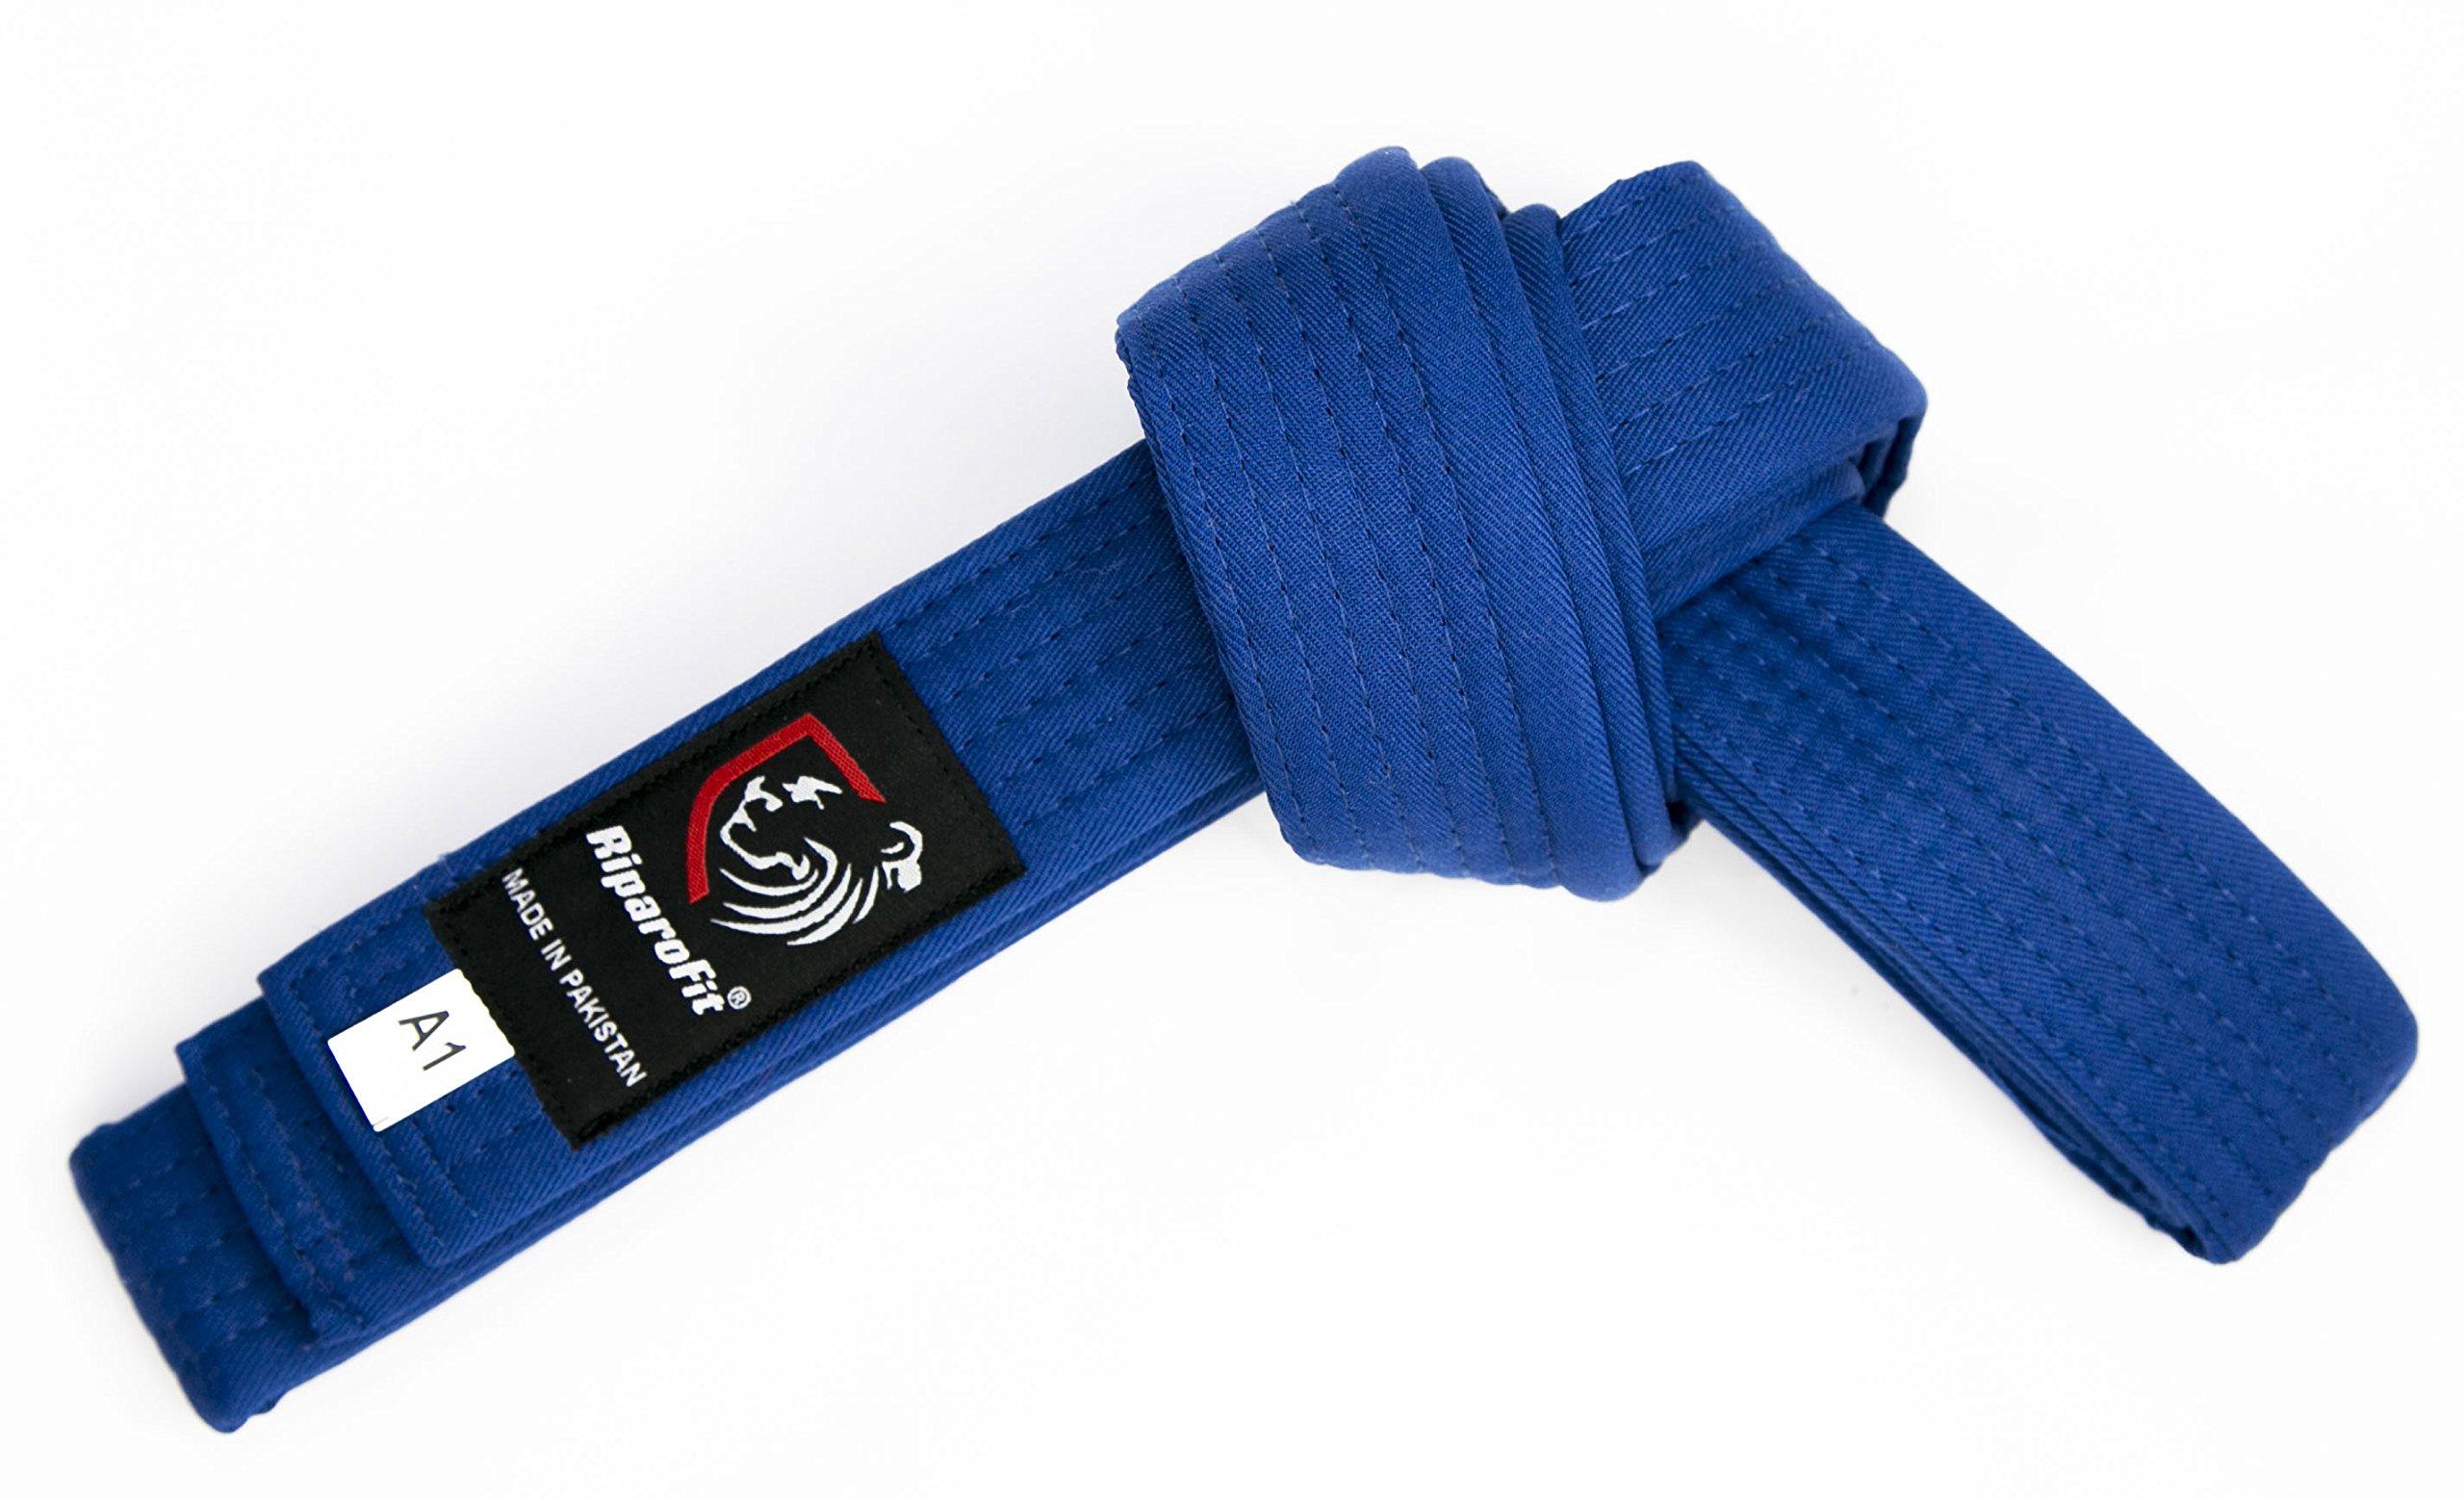 RiparoFit Brazilian Jiu Jitsu BJJ Pro Belts (Blue, A3) by RiparoFit